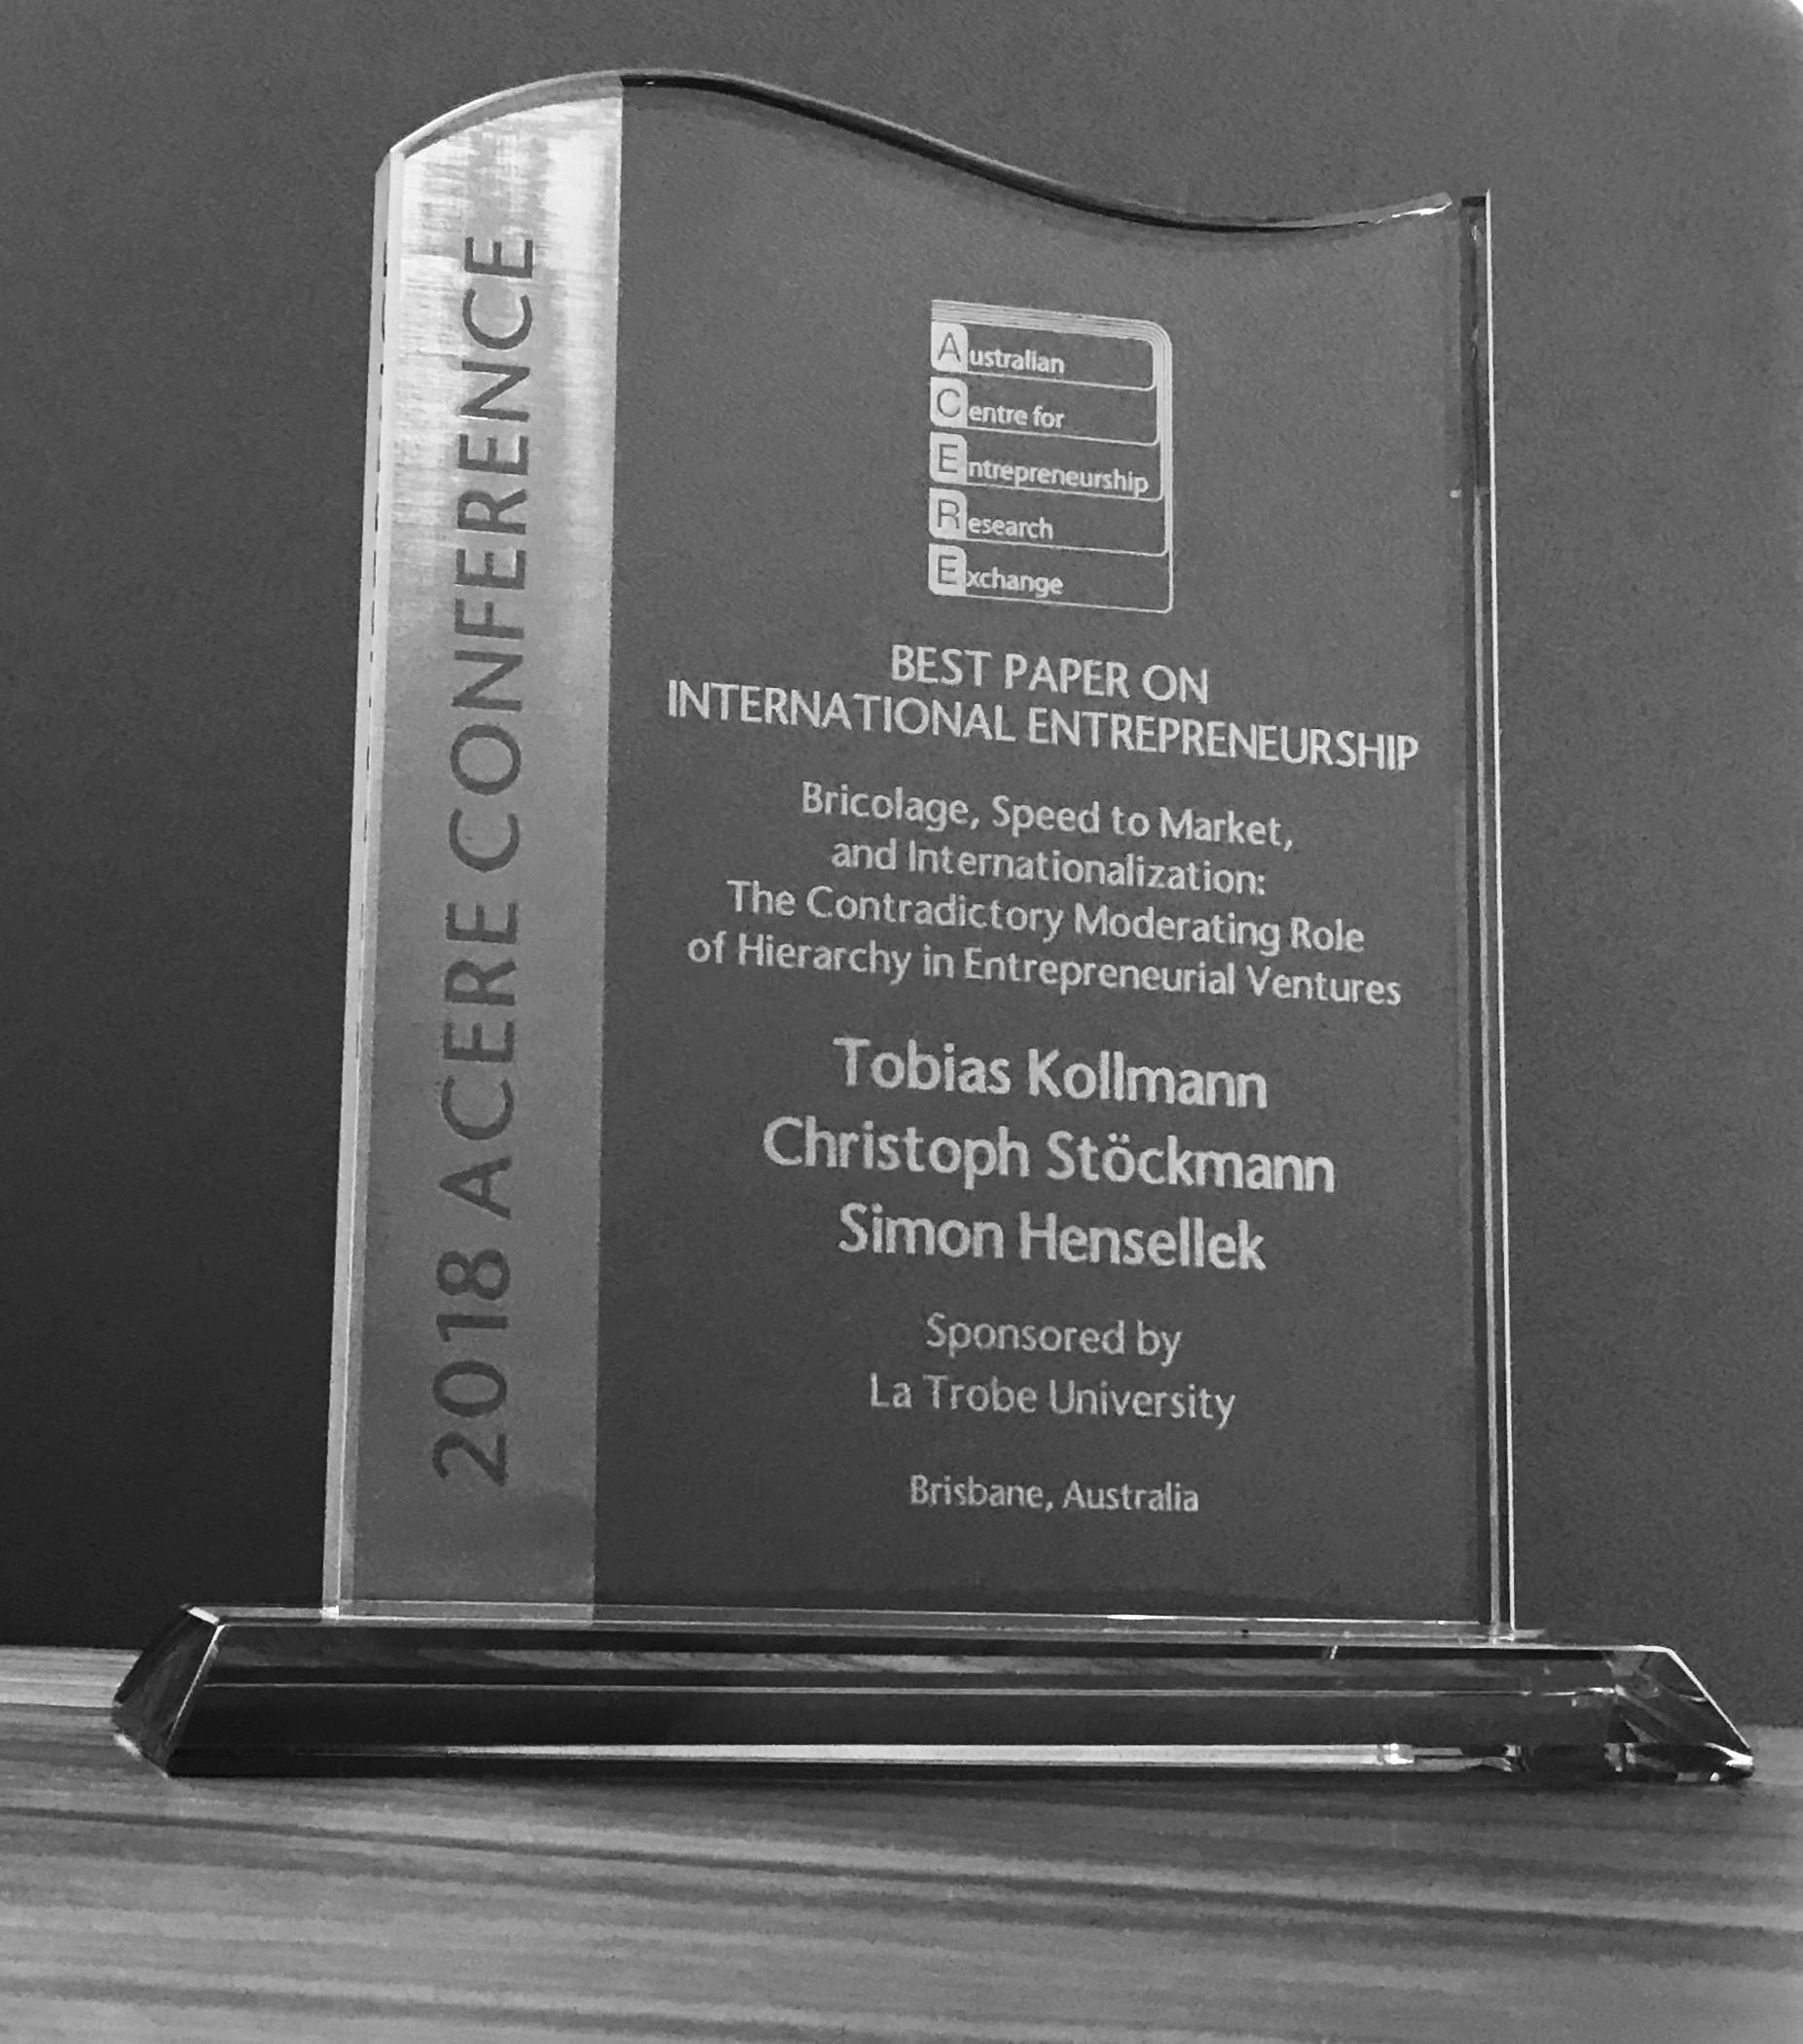 https://www.netcampus.de/fileadmin/user_upload/NEWS-Daten/Award_ACERE2018.jpg